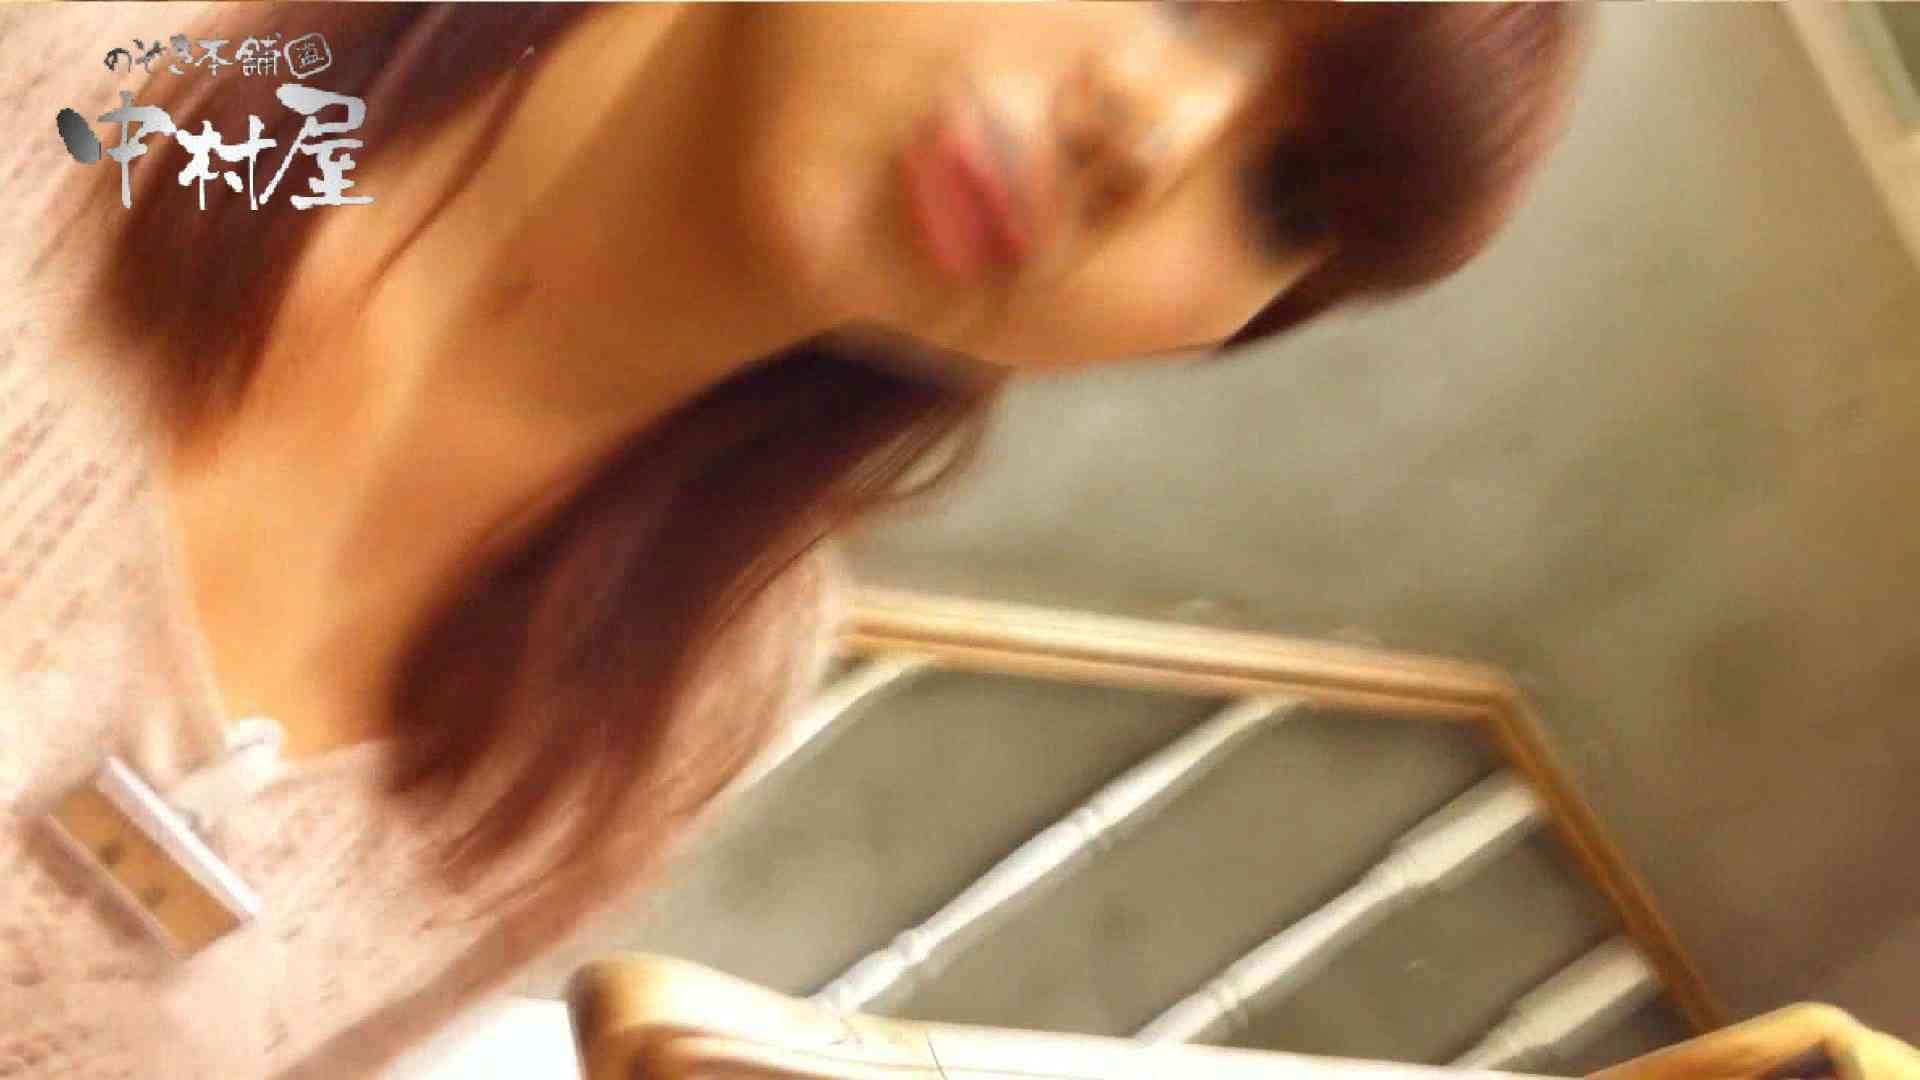 vol.56 美人アパレル胸チラ&パンチラ メガネオネーサマの下着 下着 AV無料動画キャプチャ 51連発 35